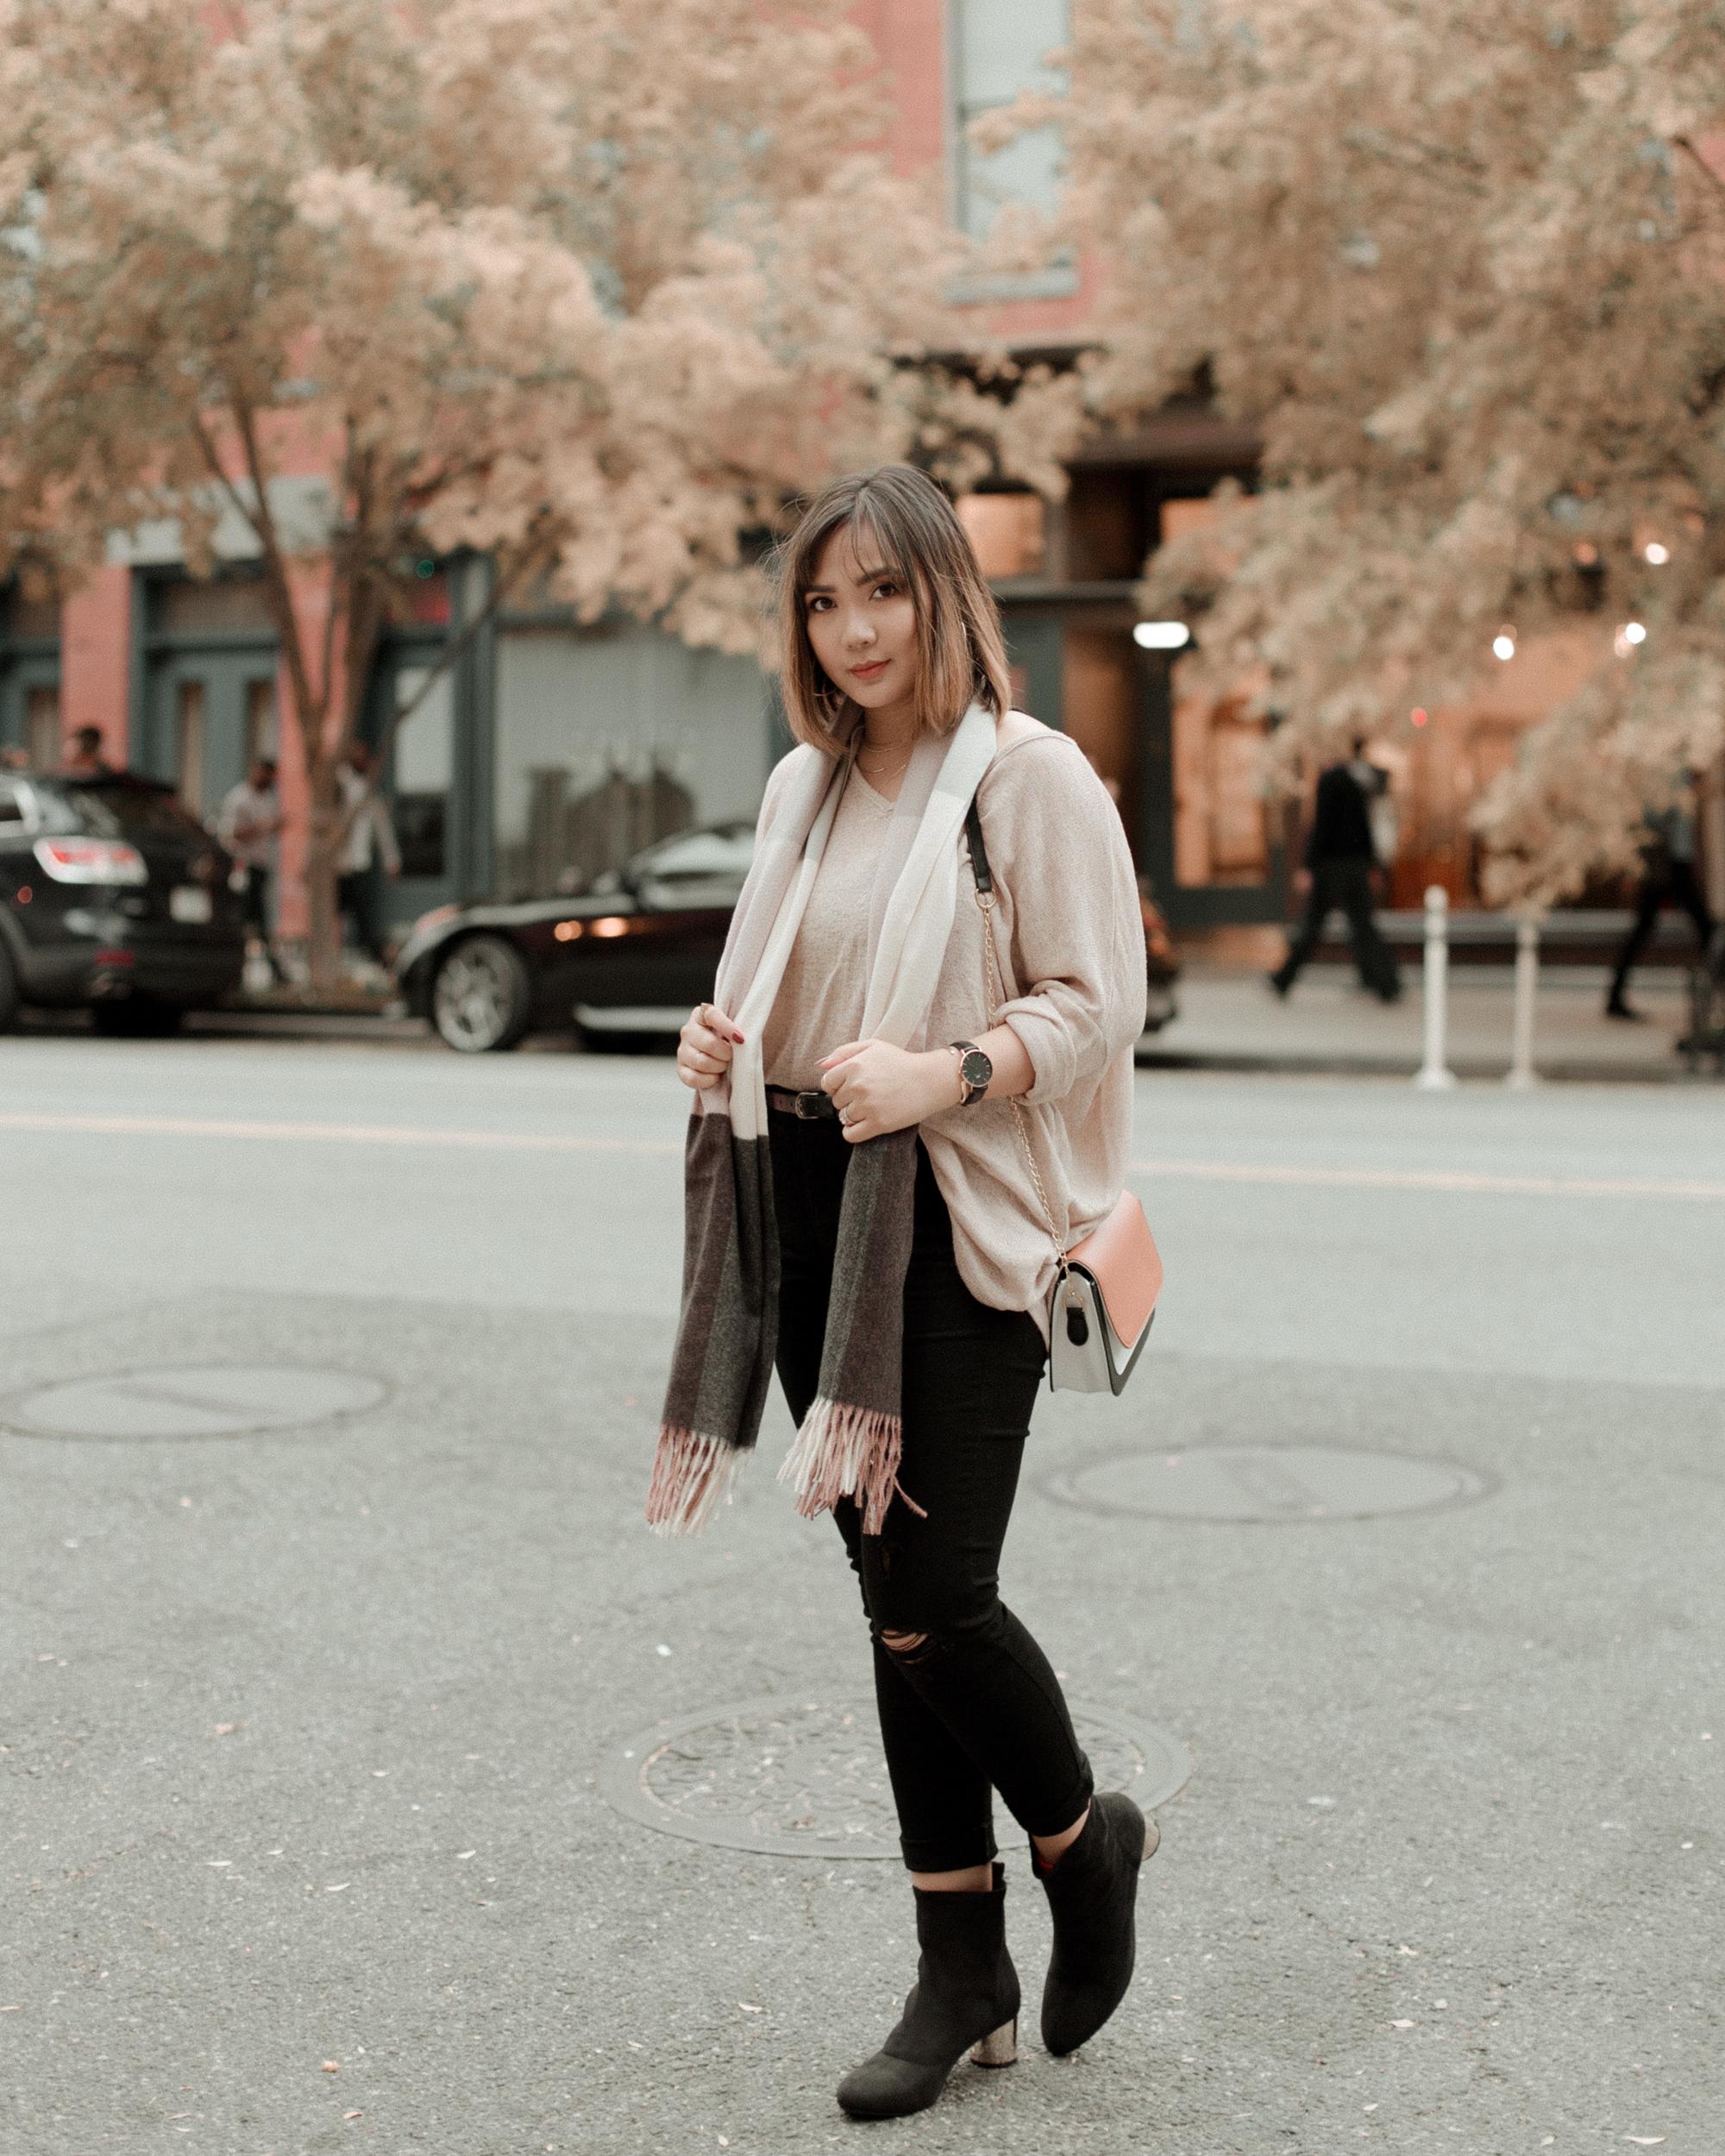 Thrift Store Diaries - Super Oversized Sweater